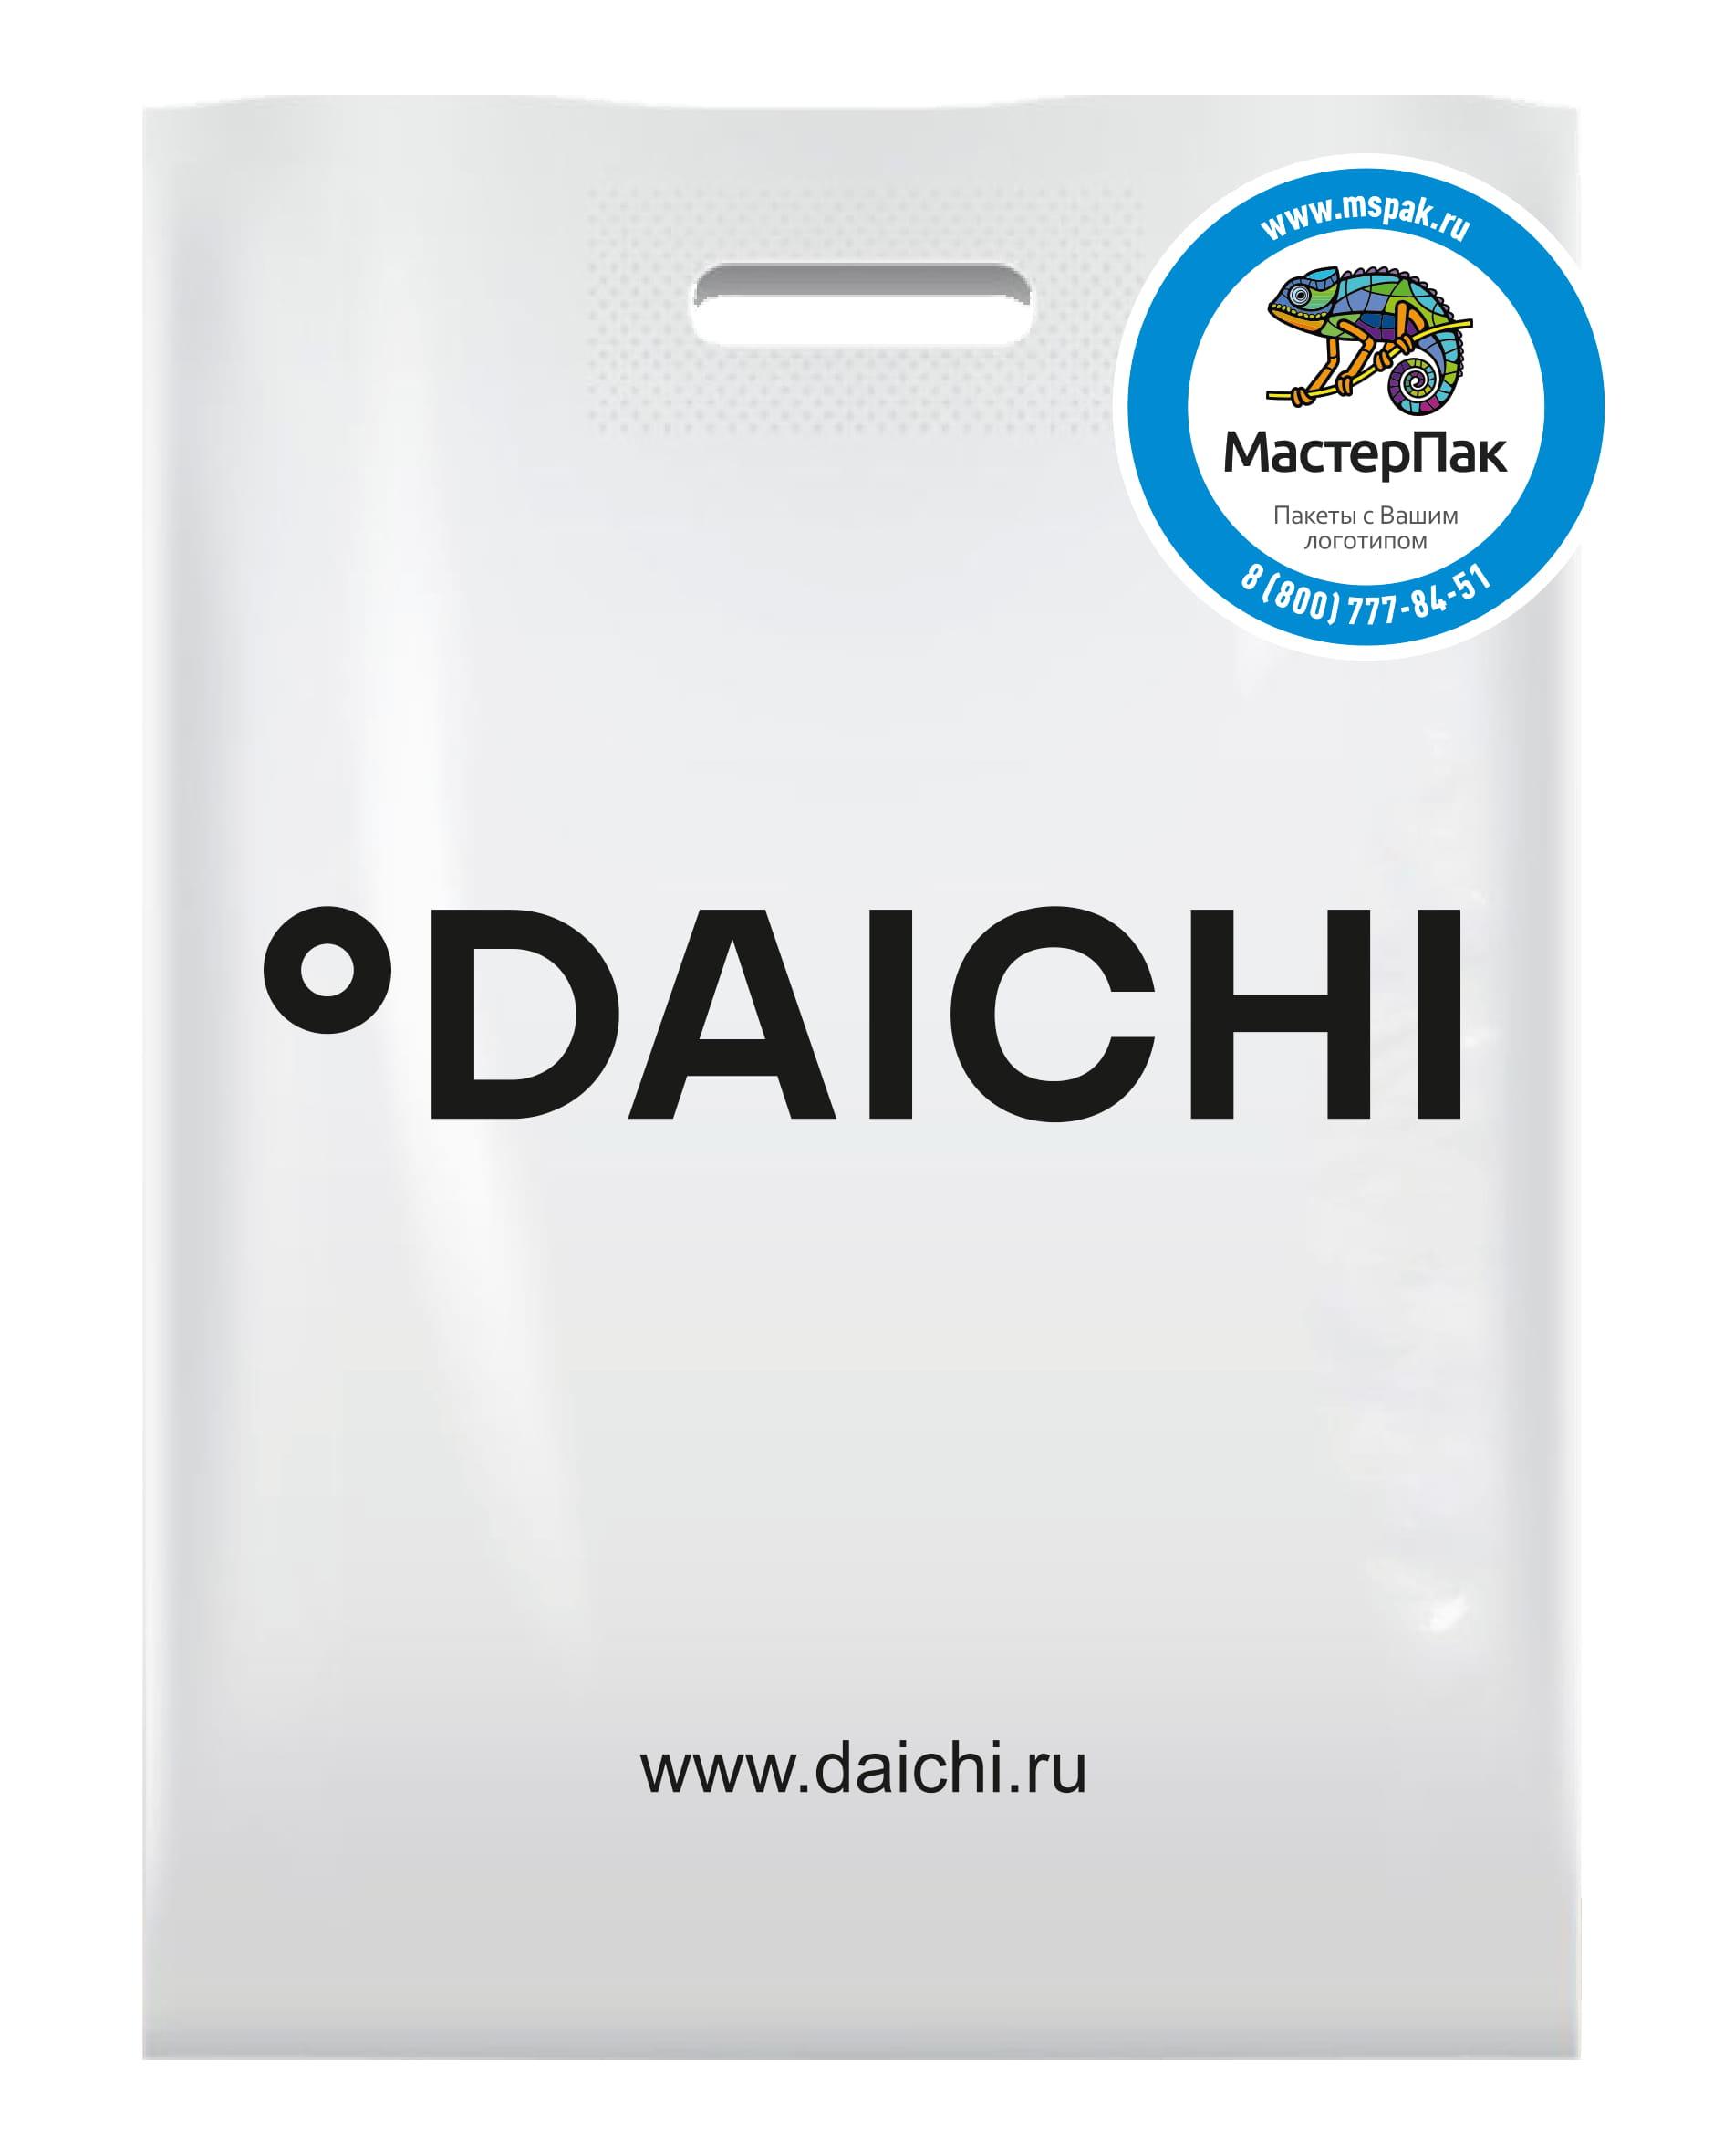 Пакет ПВД с логотипом Daichi, Москва, 70 мкм, белый